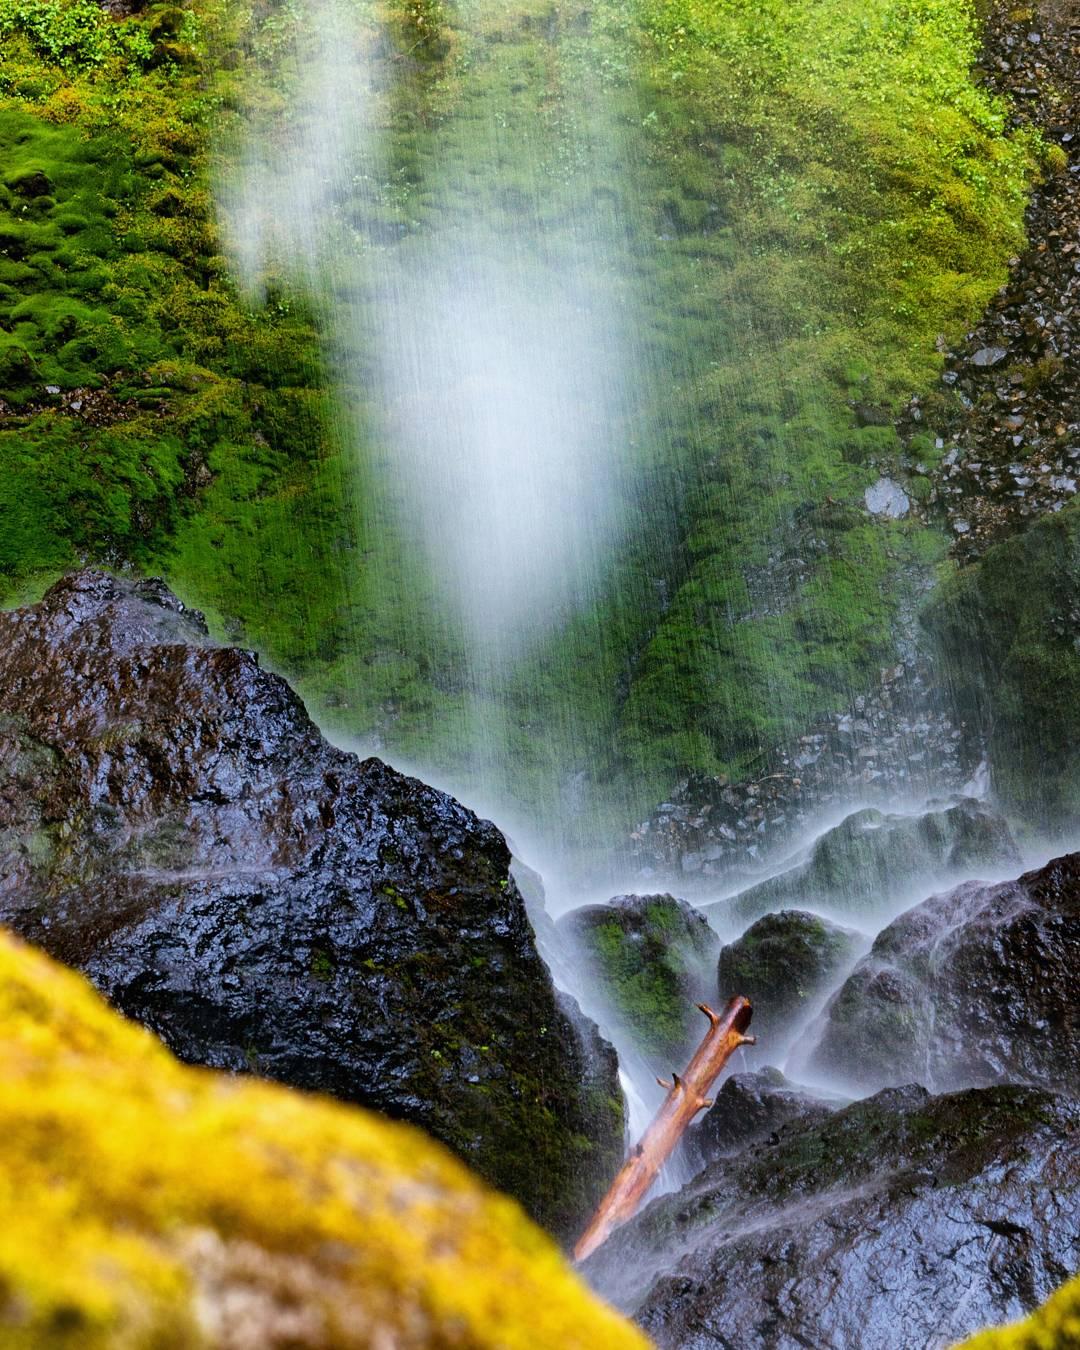 Wasim Muklashy Photography_Wasim of Nazareth Photography_Pacific Northwest_Oregon Washington_Months 1-3 Highlights_044.jpg